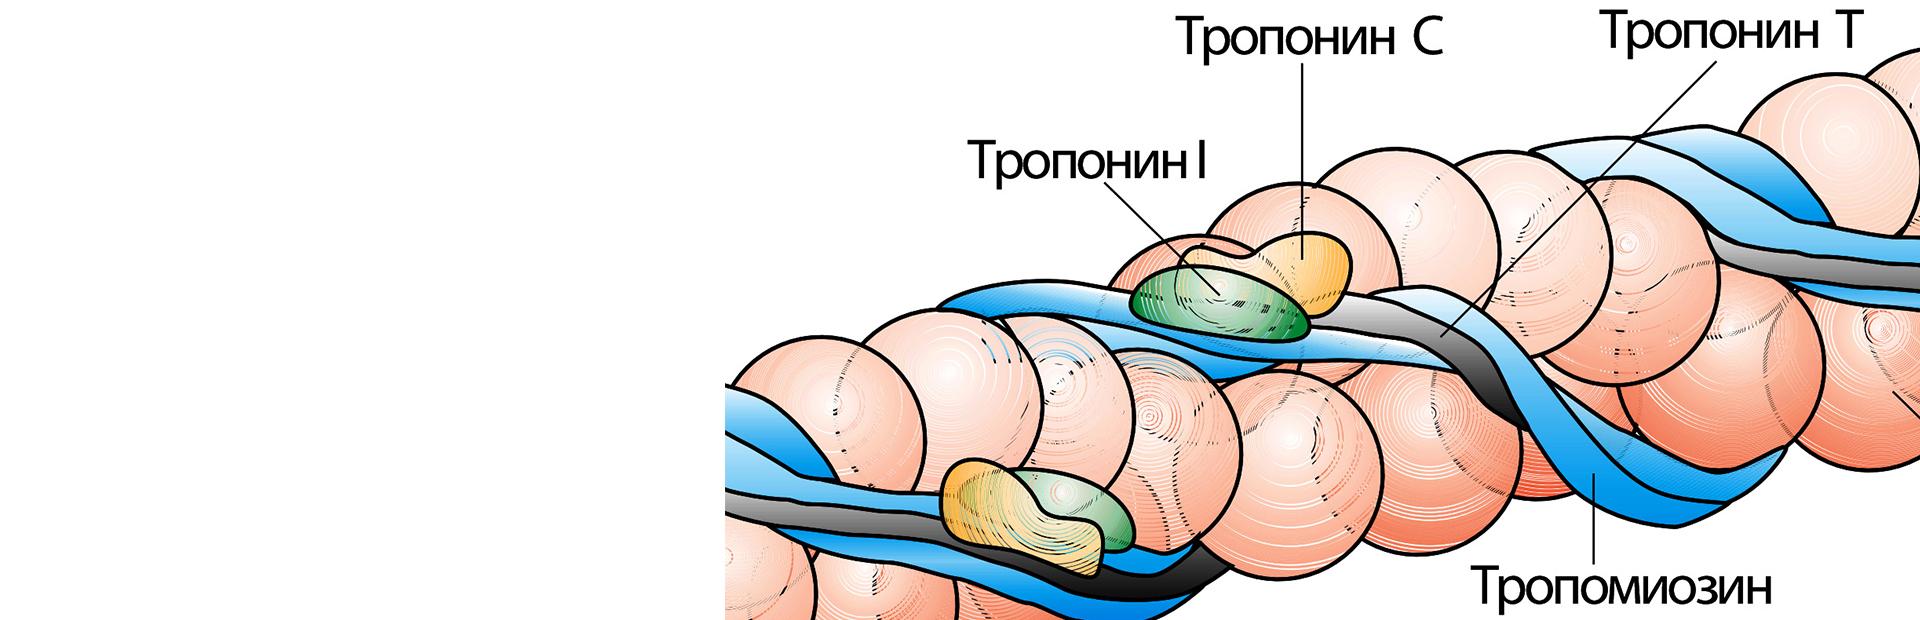 Кардиоспецифичные белки